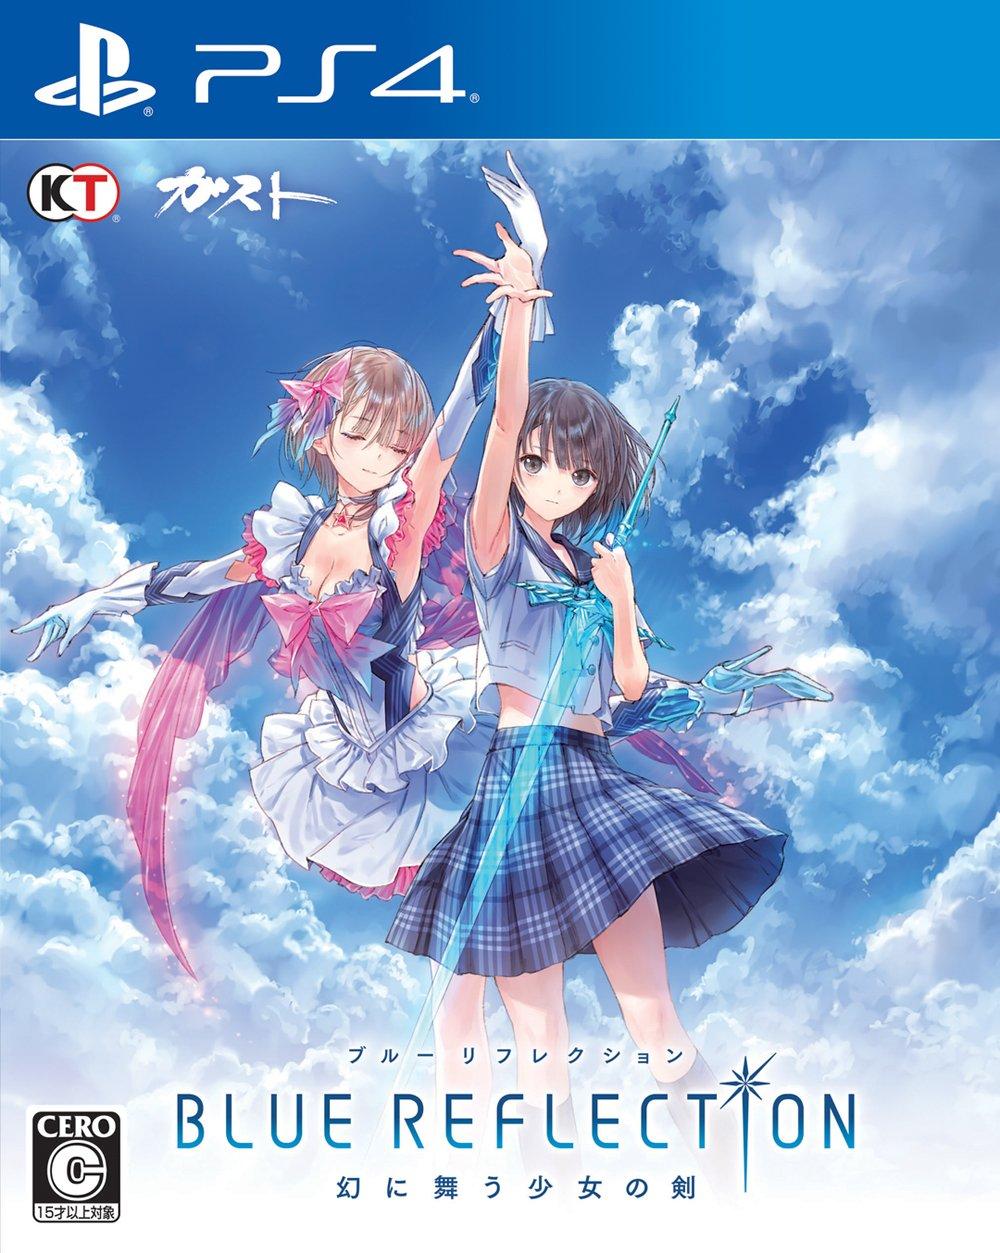 Mua Blue Reflection Maboroshi Ni Mau Shoujo No Ken Ps4 Tren Amazon Nhật Chinh Hang Fado